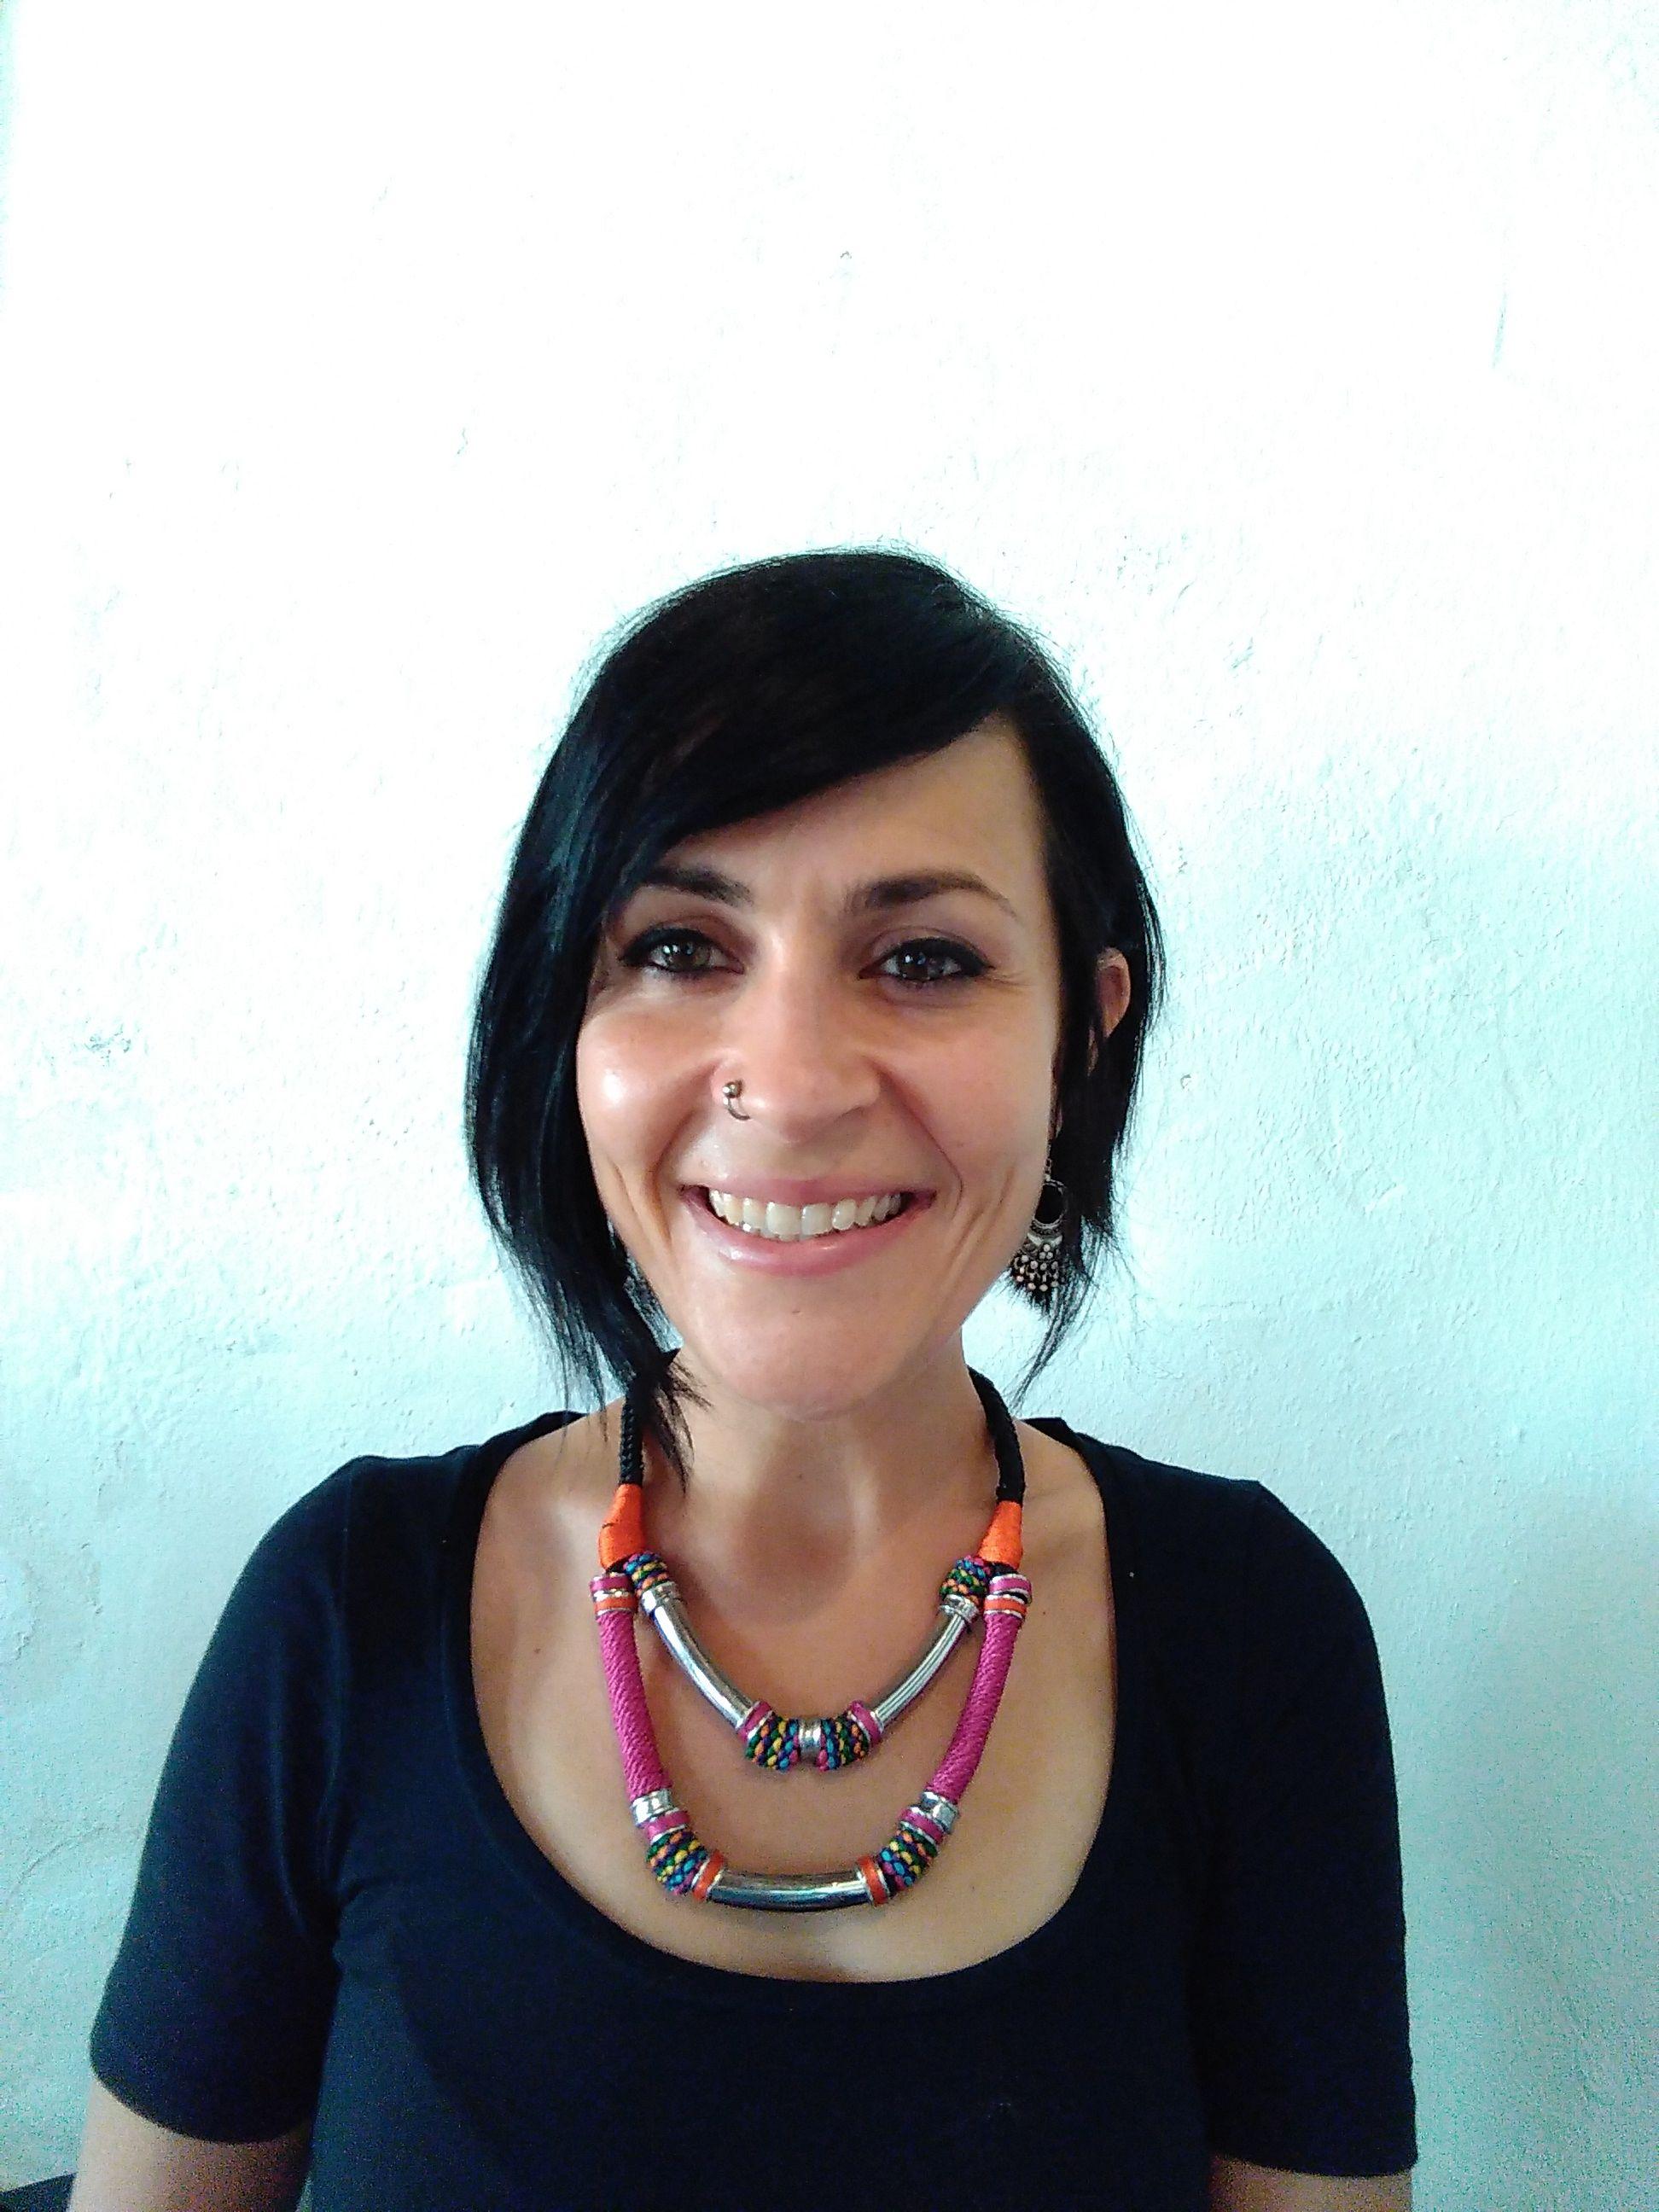 Chiqui Ruiz italki Lehrerin seit 2016